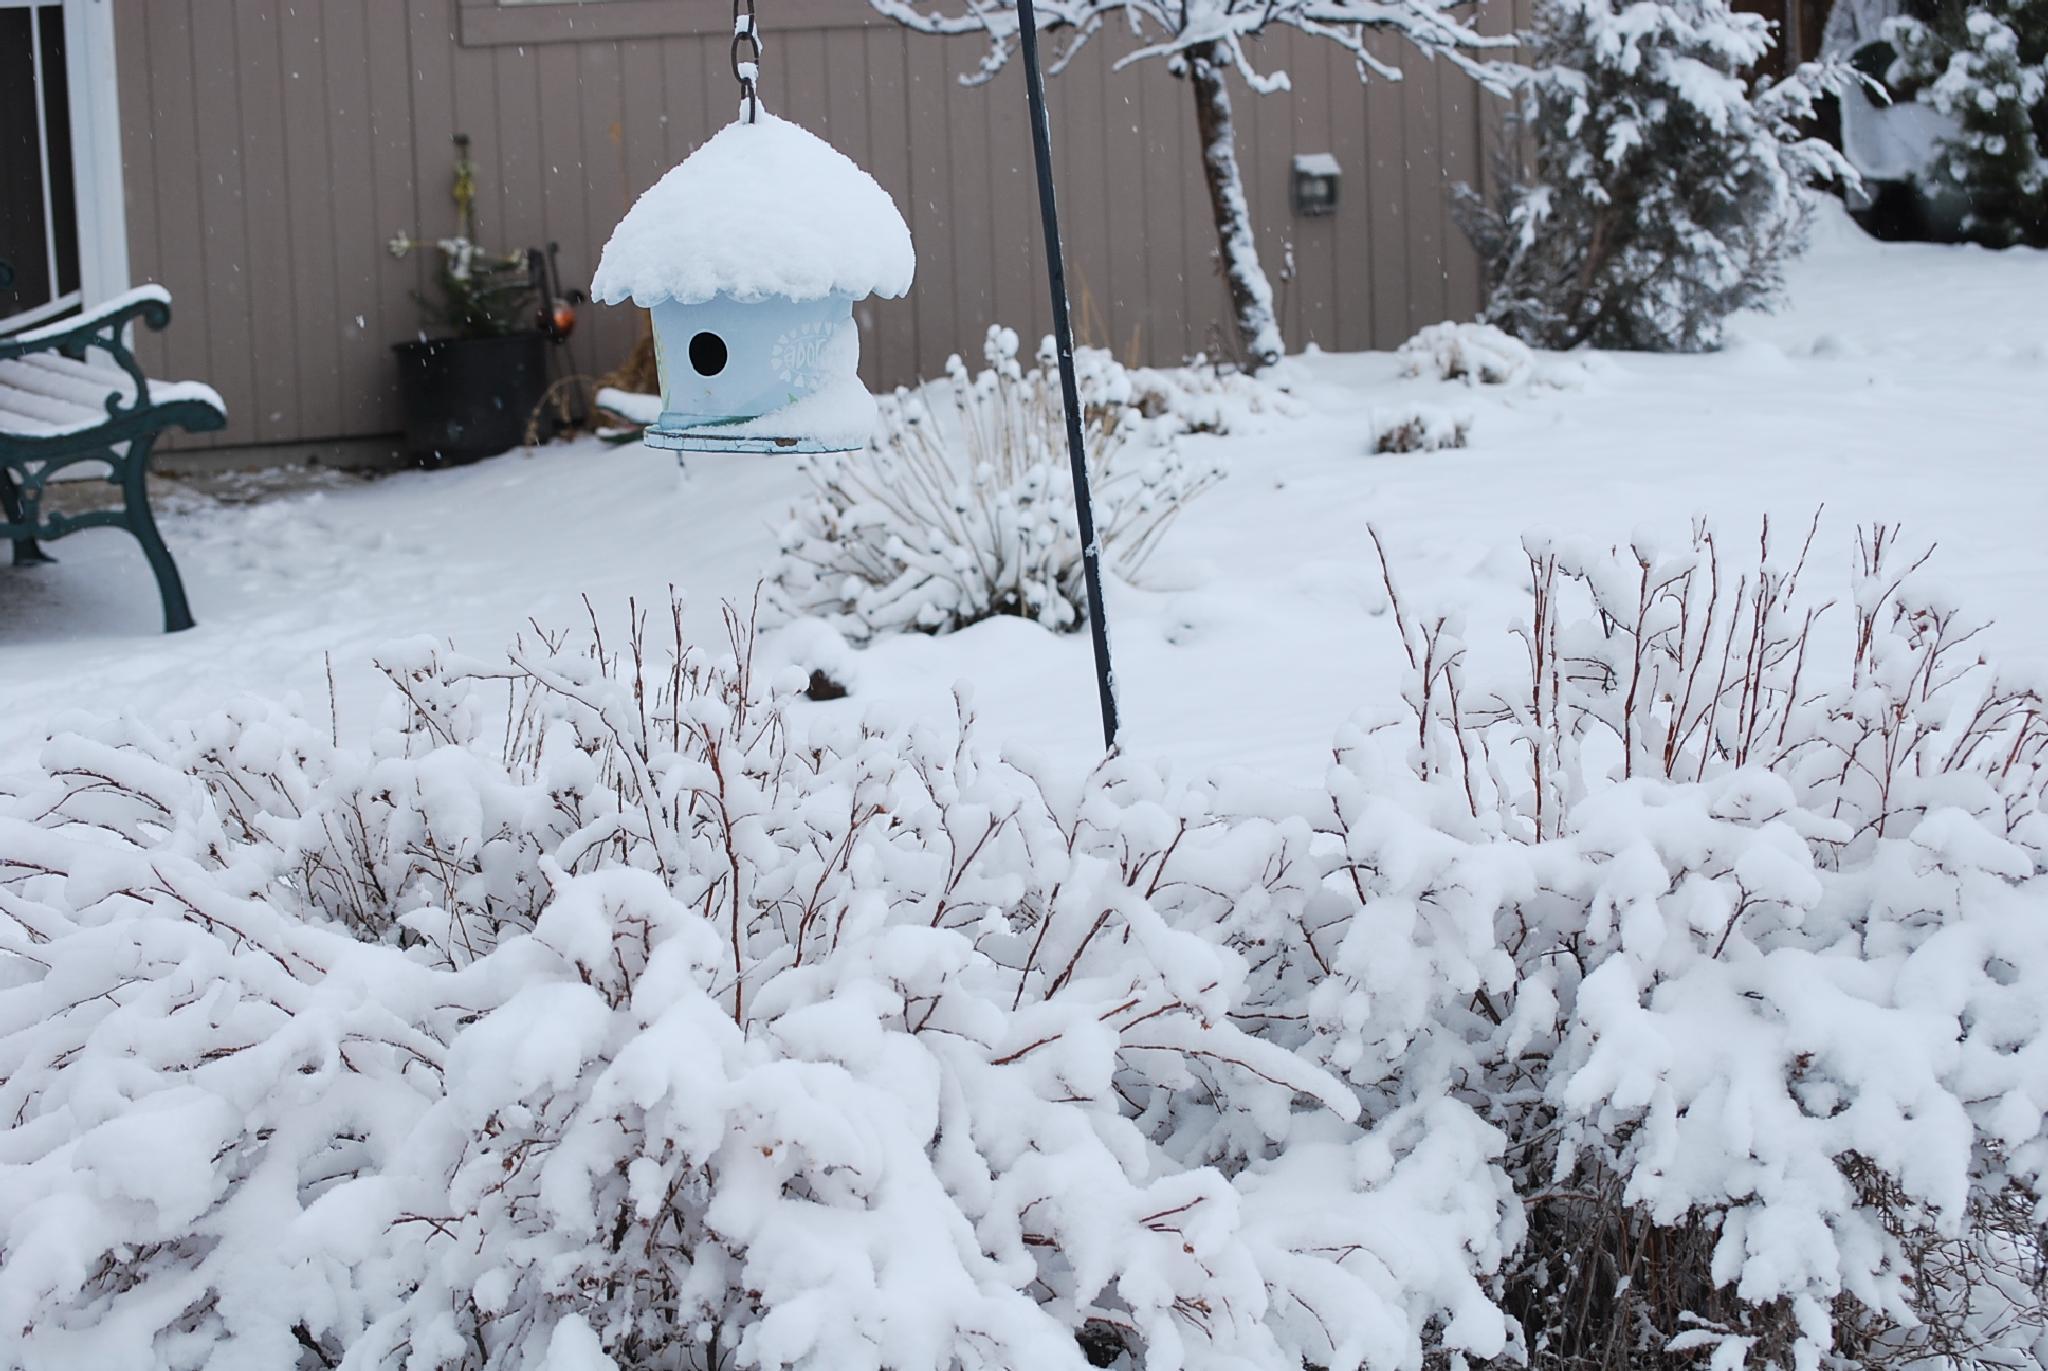 Heavy Snow by marilyn wirtz